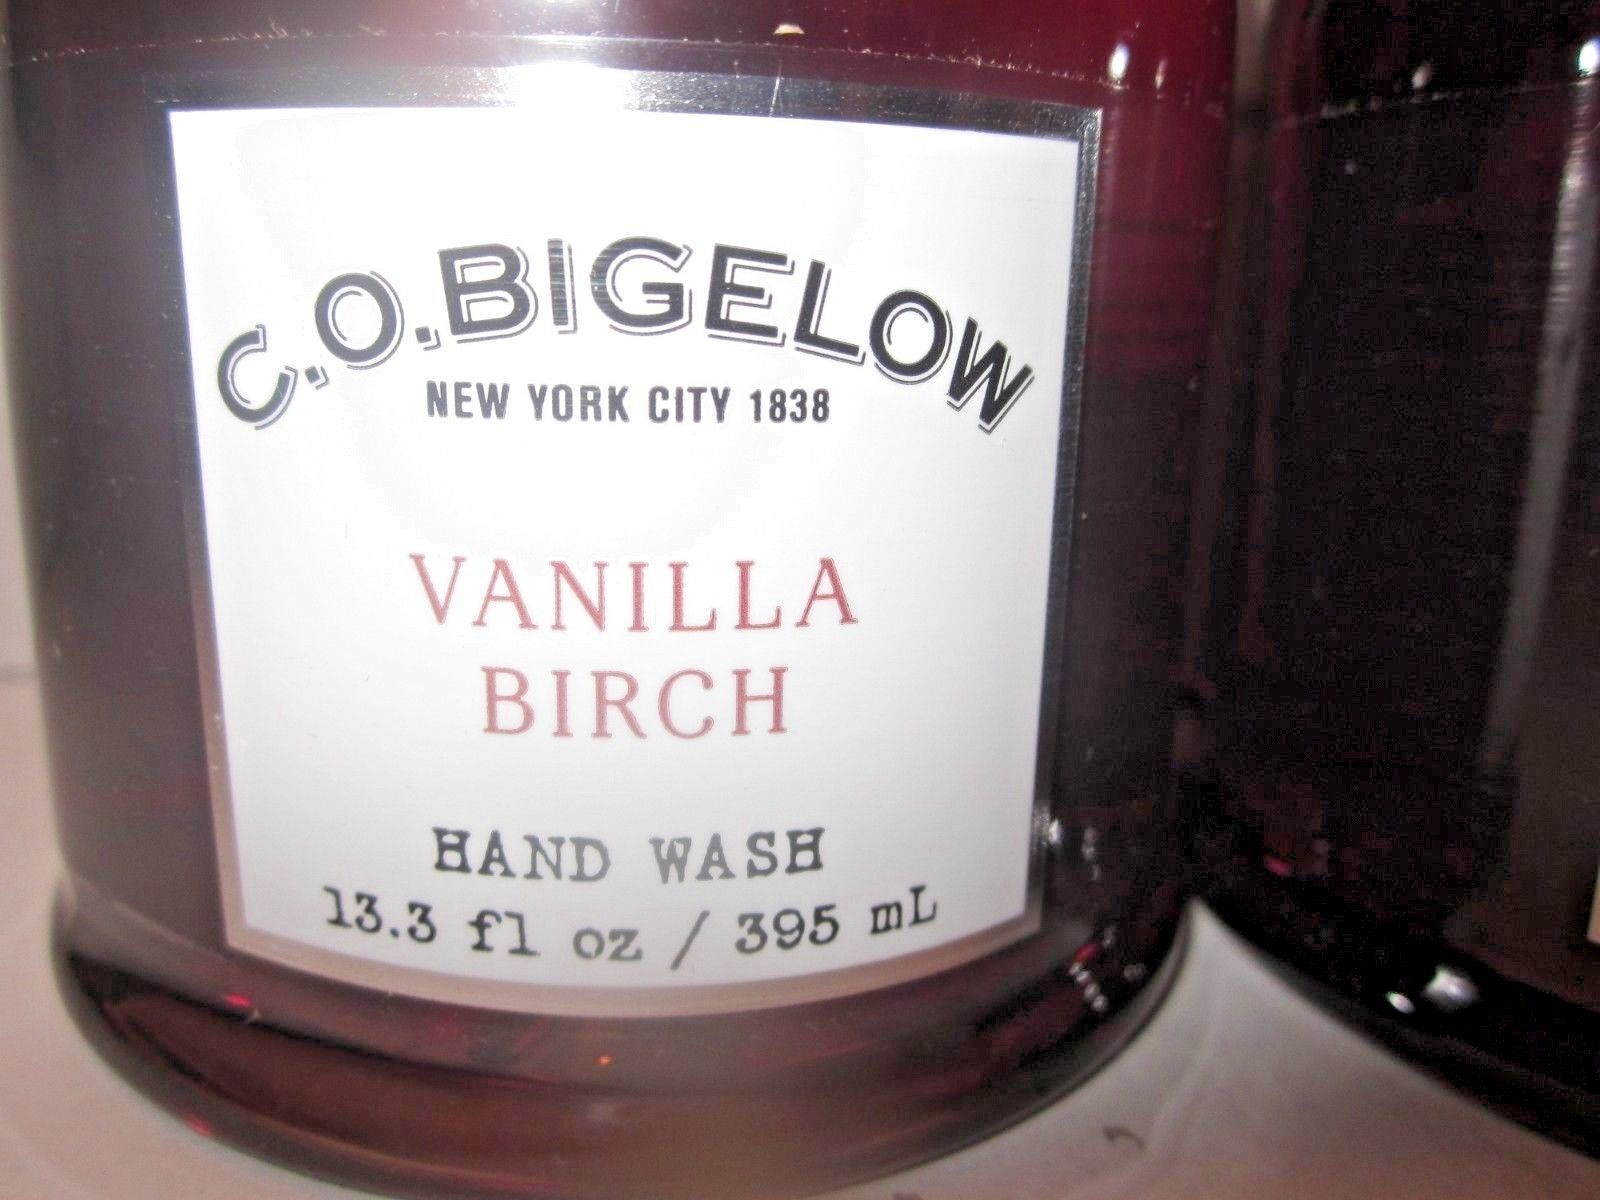 2 bottles Bath & Body Works CO Bigelow Hand Wash Soap 13.3 oz  Vanilla Birch